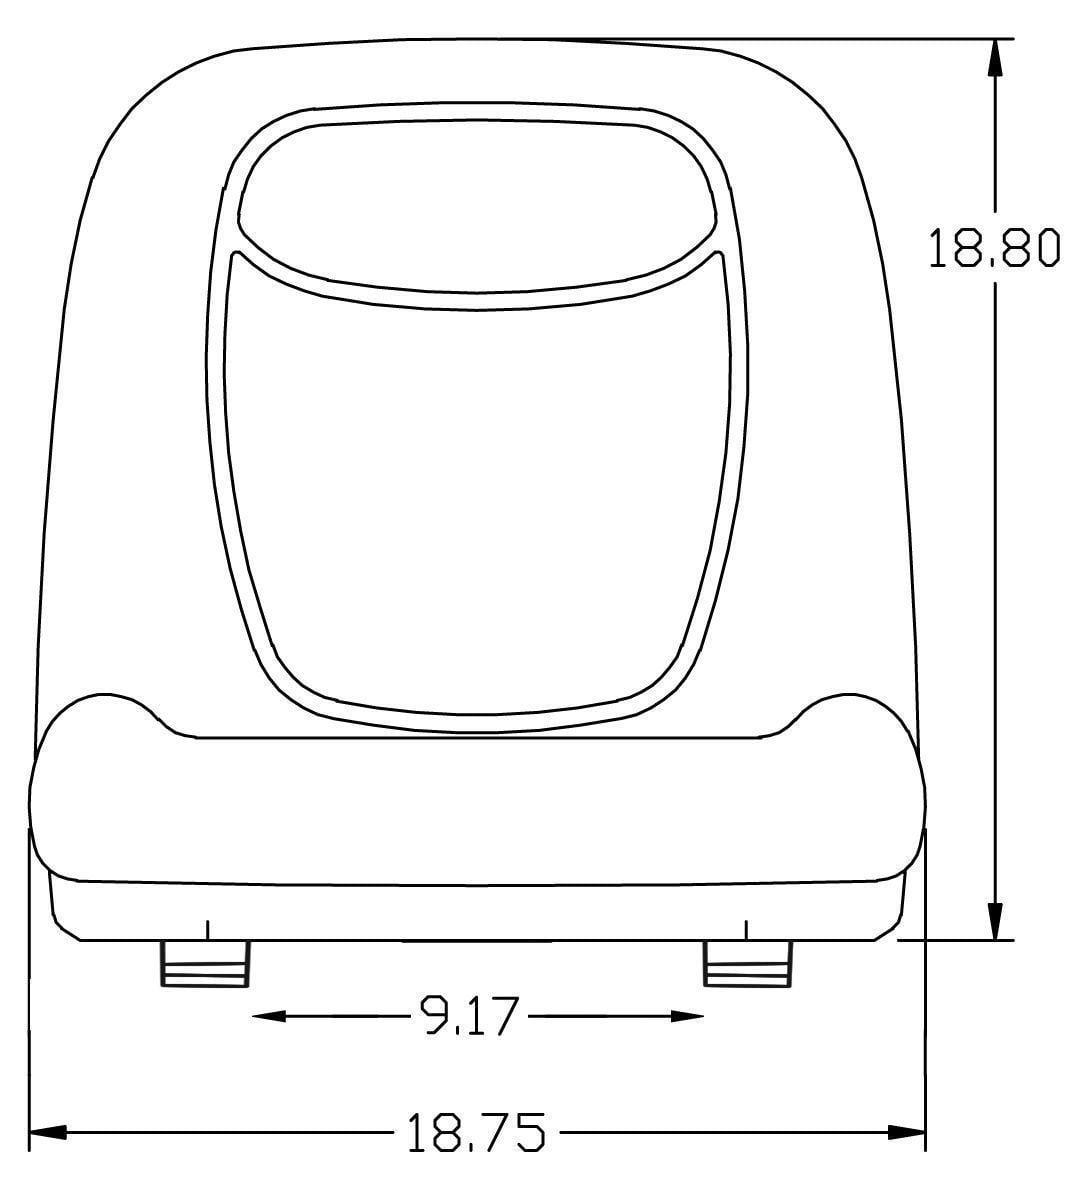 Seat For John Deere X300 X300r X310 X320 X330 X340